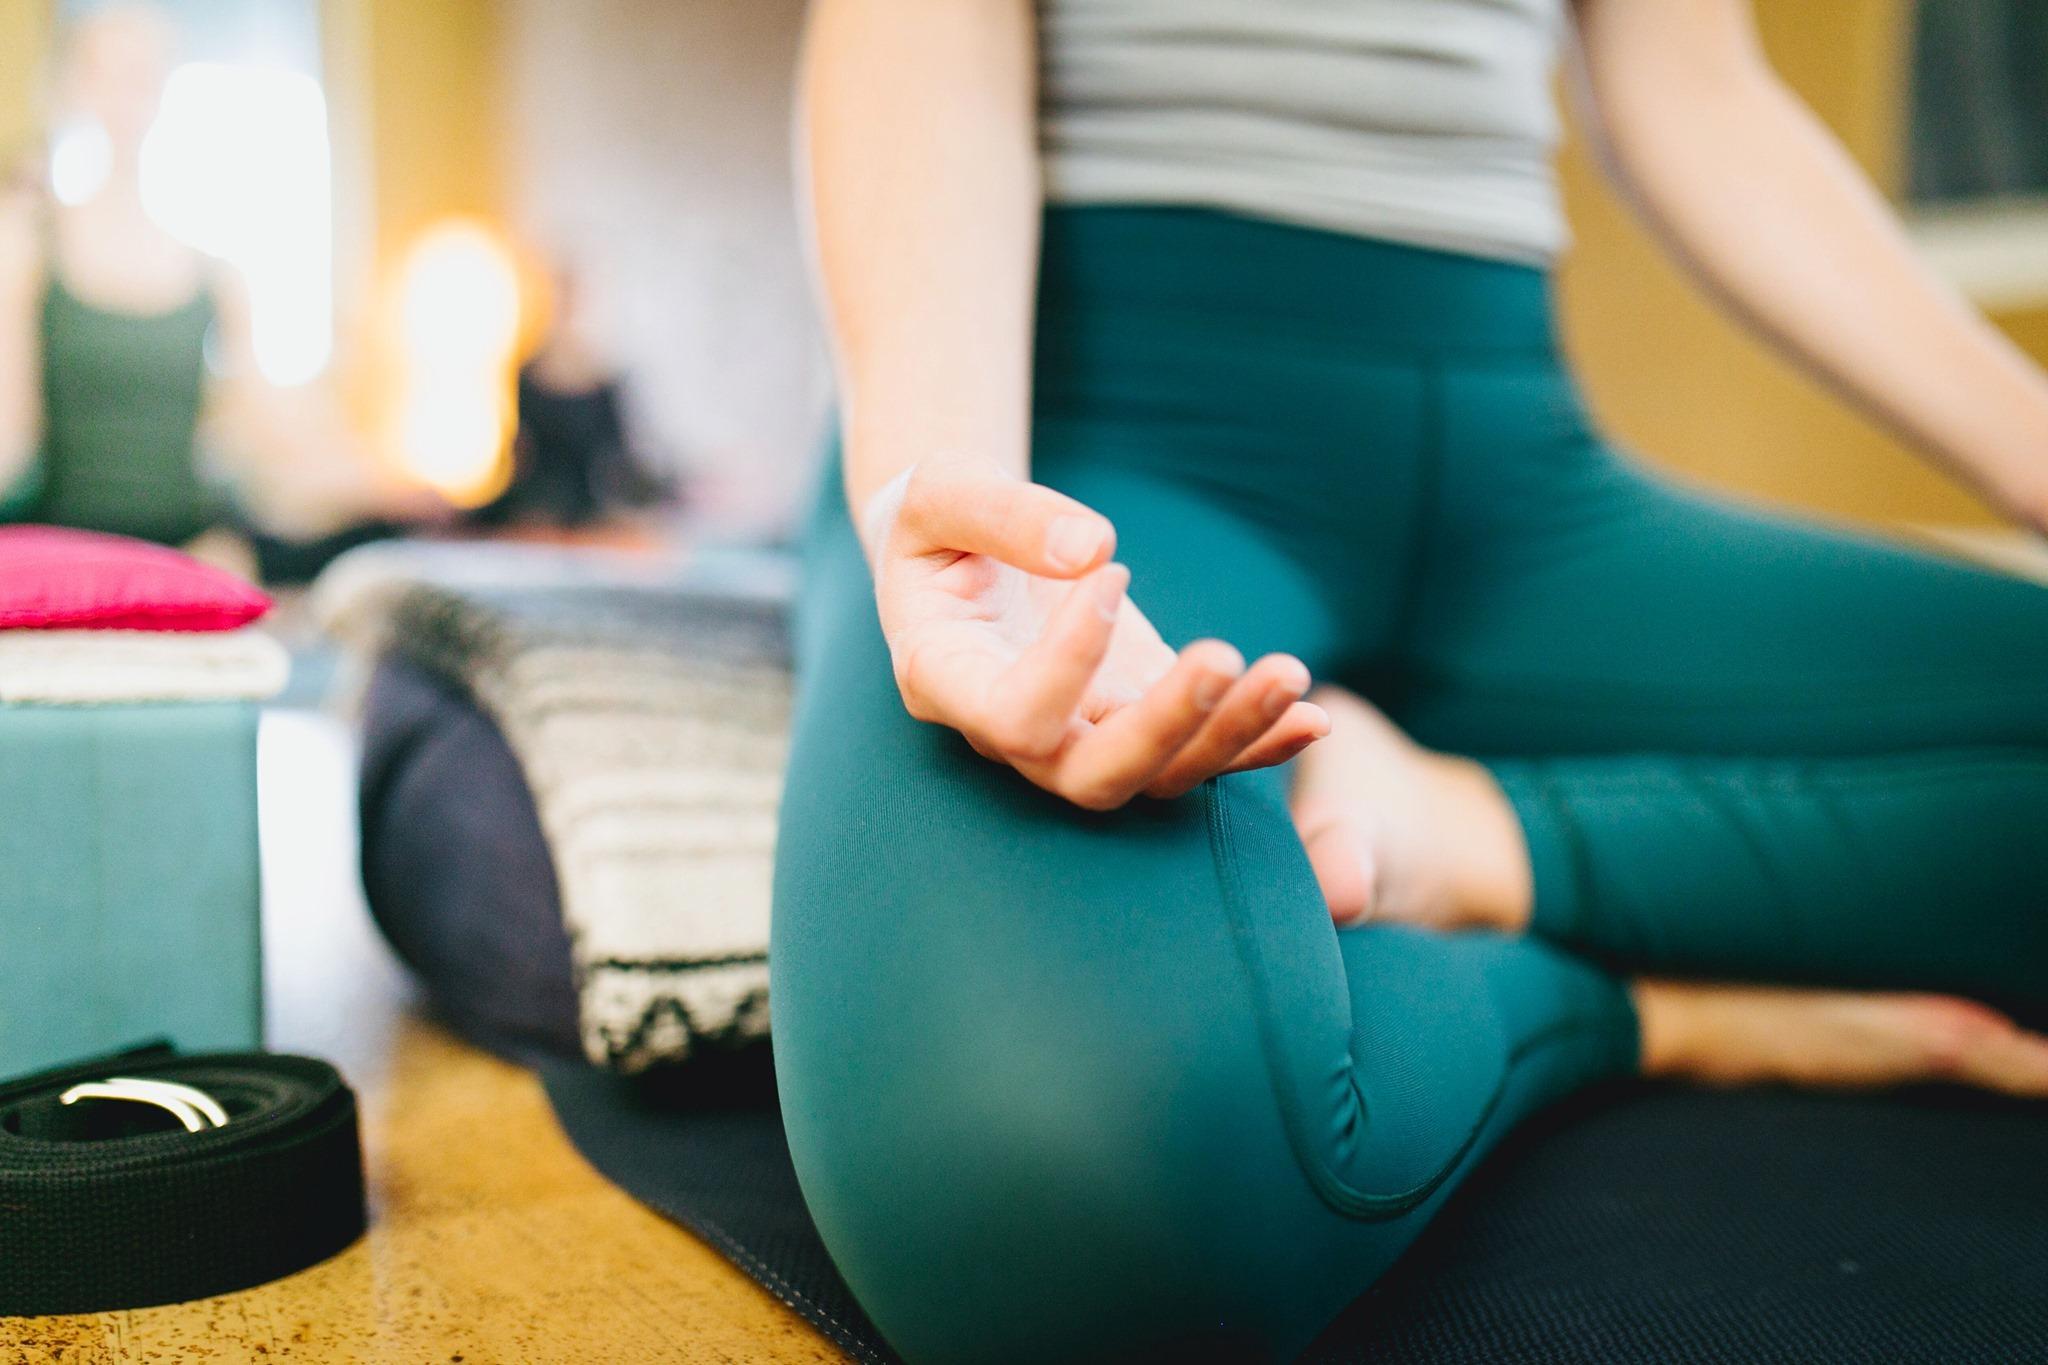 Full Workshop - Yoga Nidra Level 2